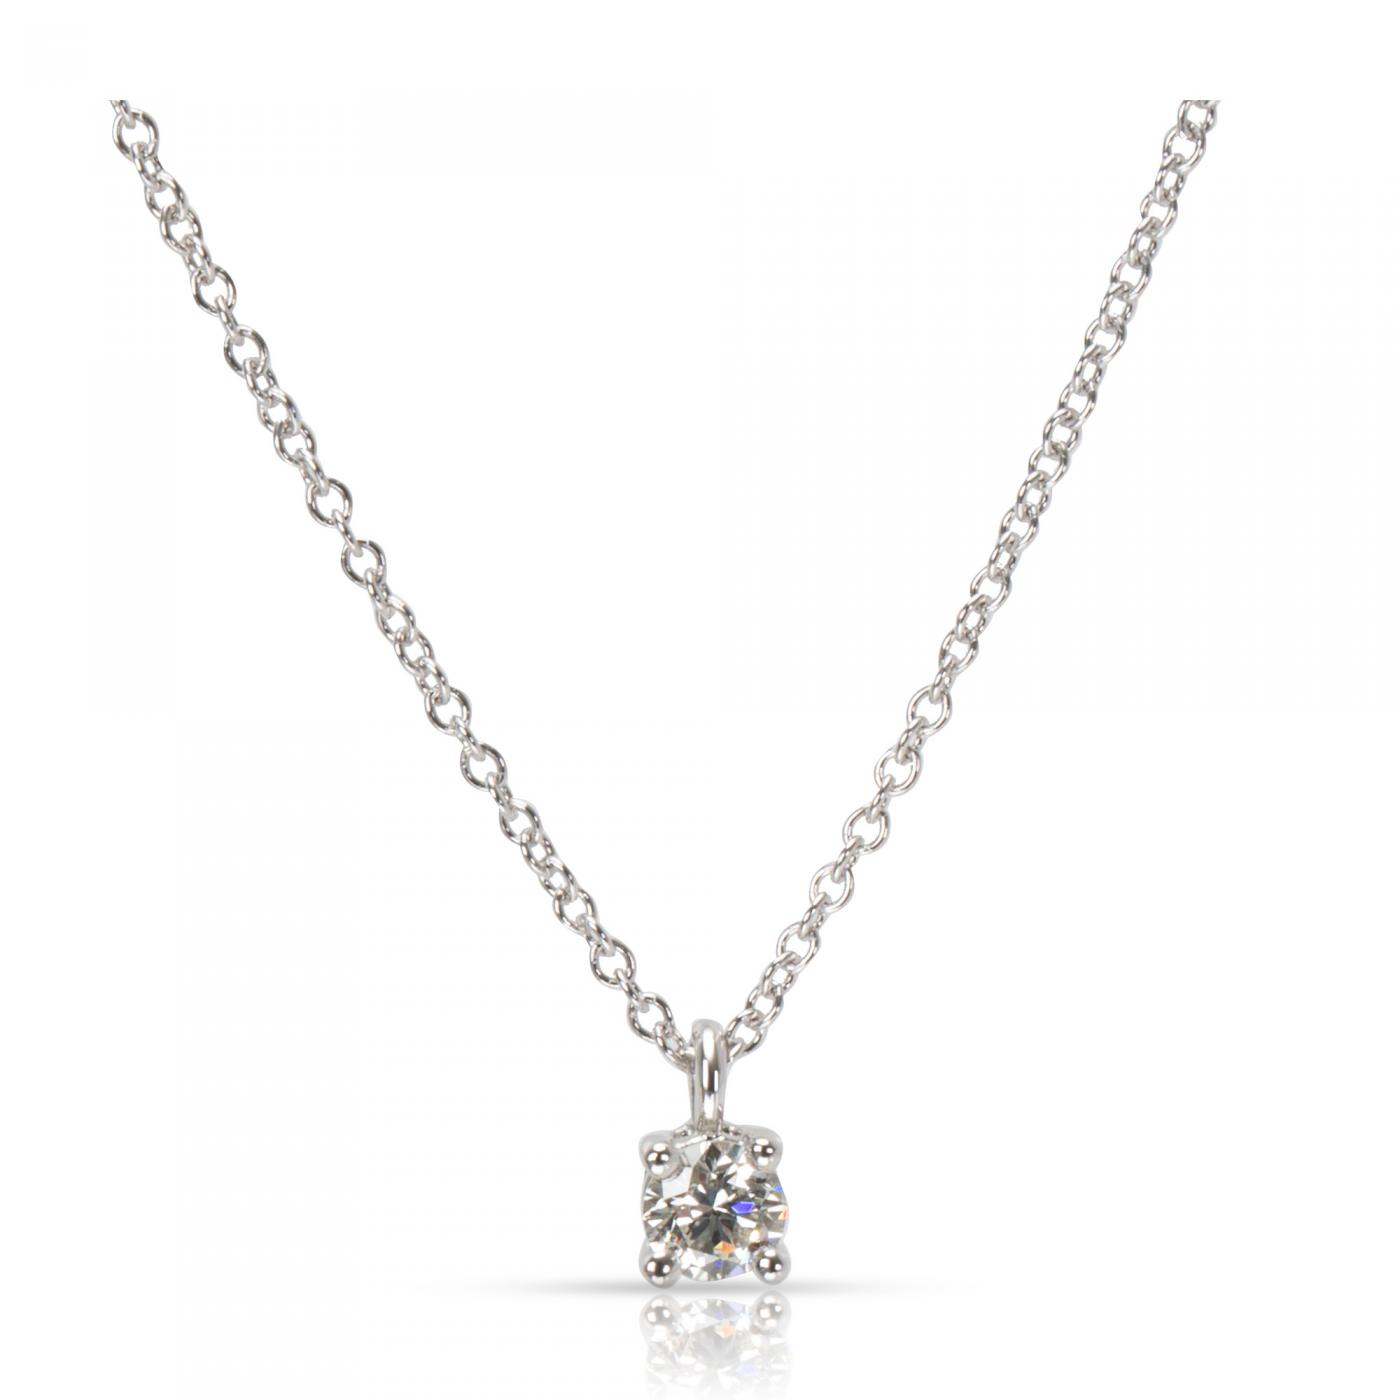 Tiffany And Co Tiffany Co Diamond Solitaire Pendant In Platinum 0 18 Ctw